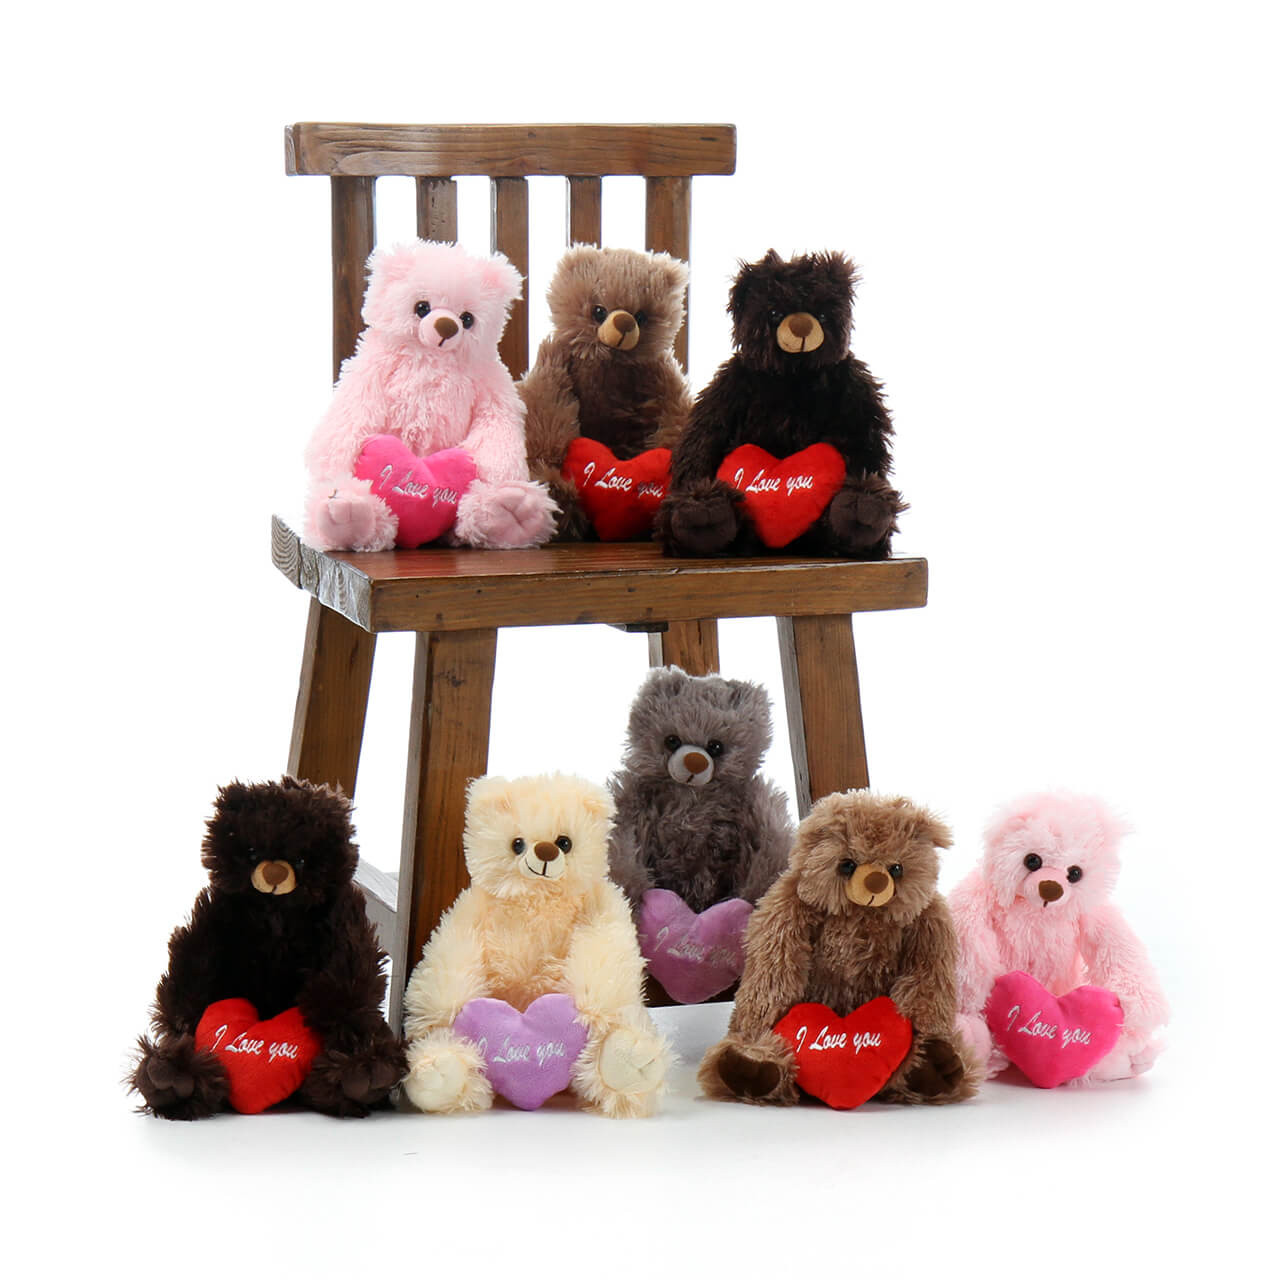 Cute Super Soft Teddy Bears with I love You Heart Pillows